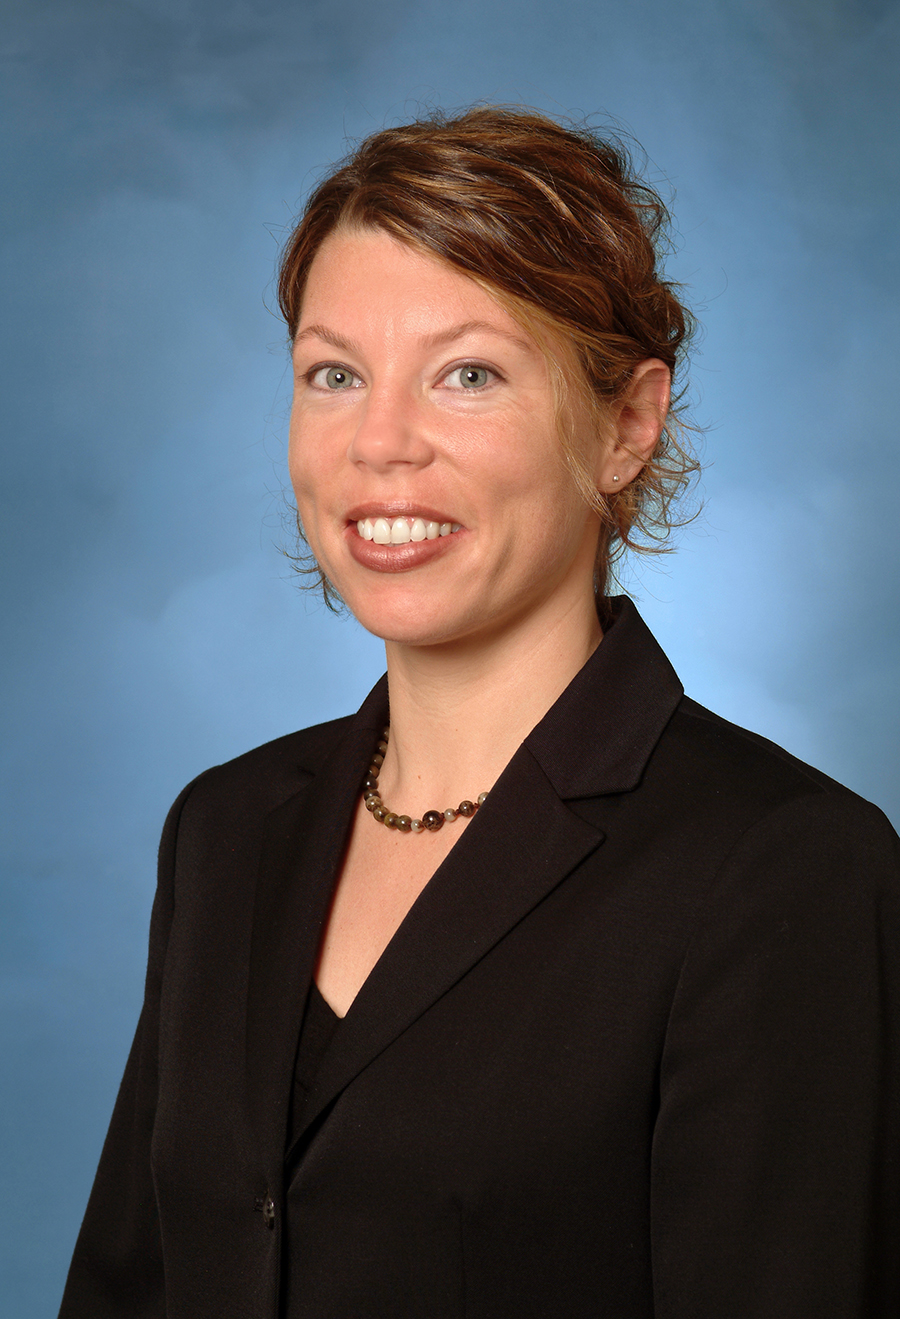 Sabine Hoover